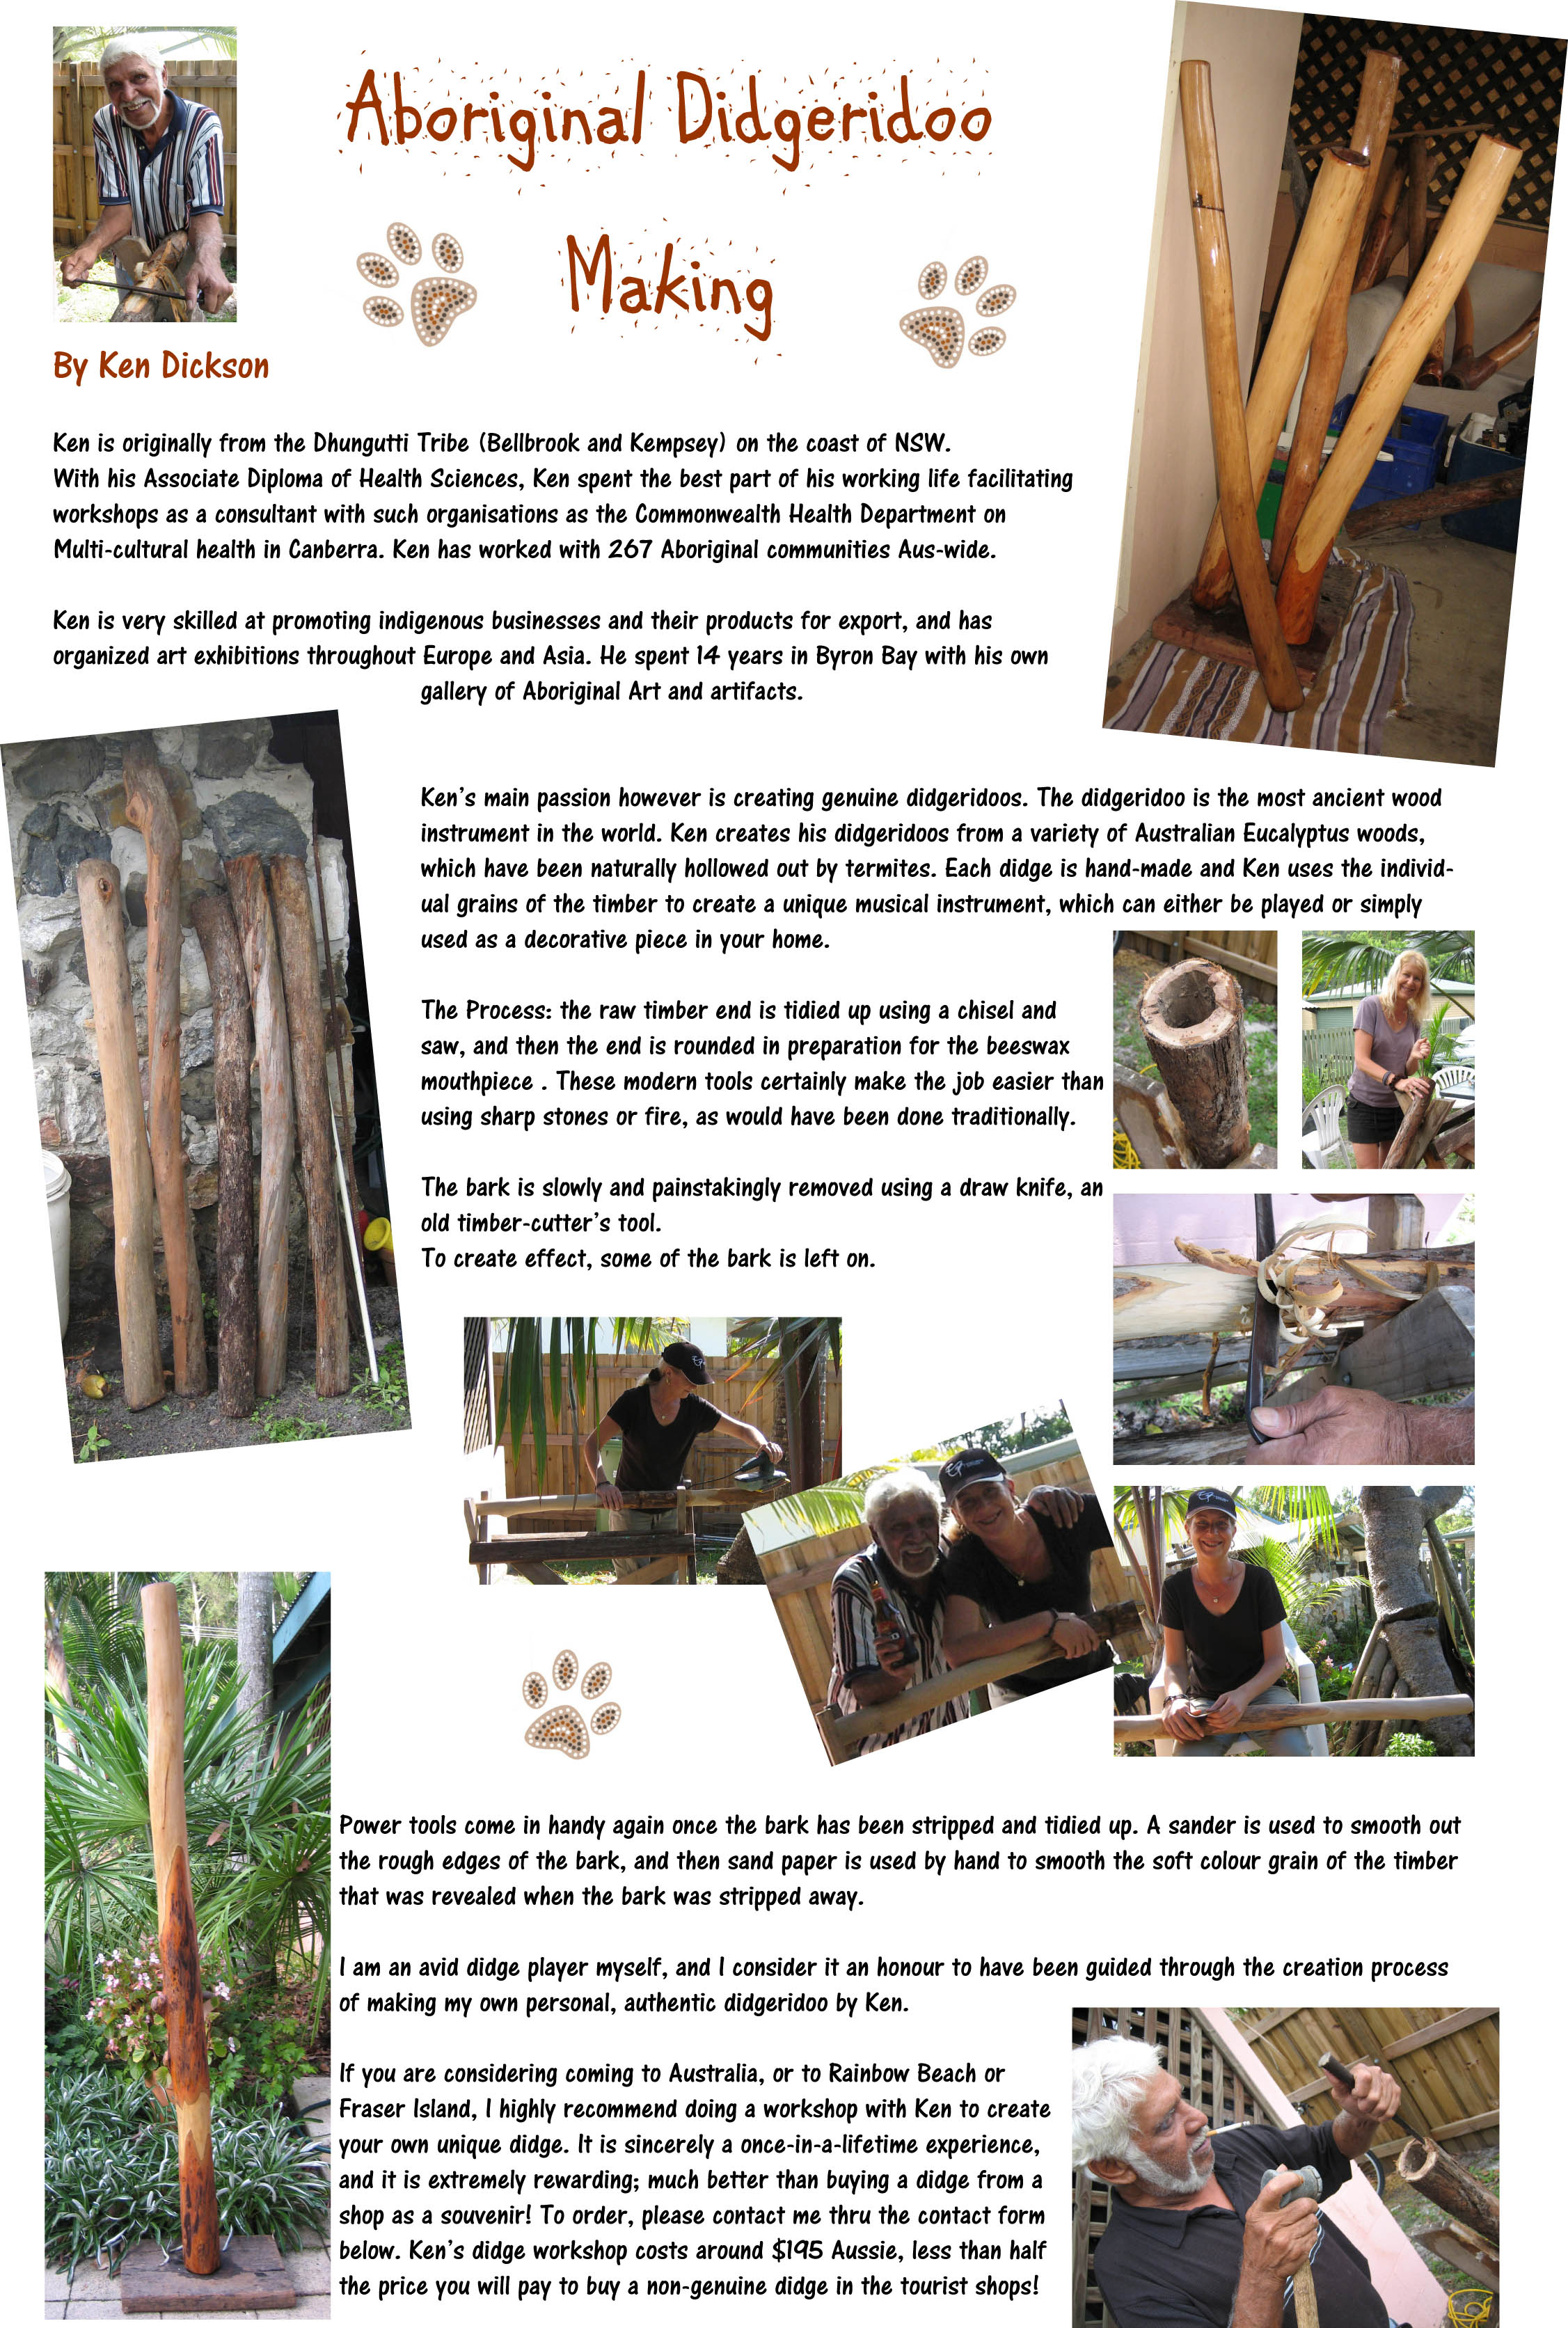 Didgeridoo making.pub